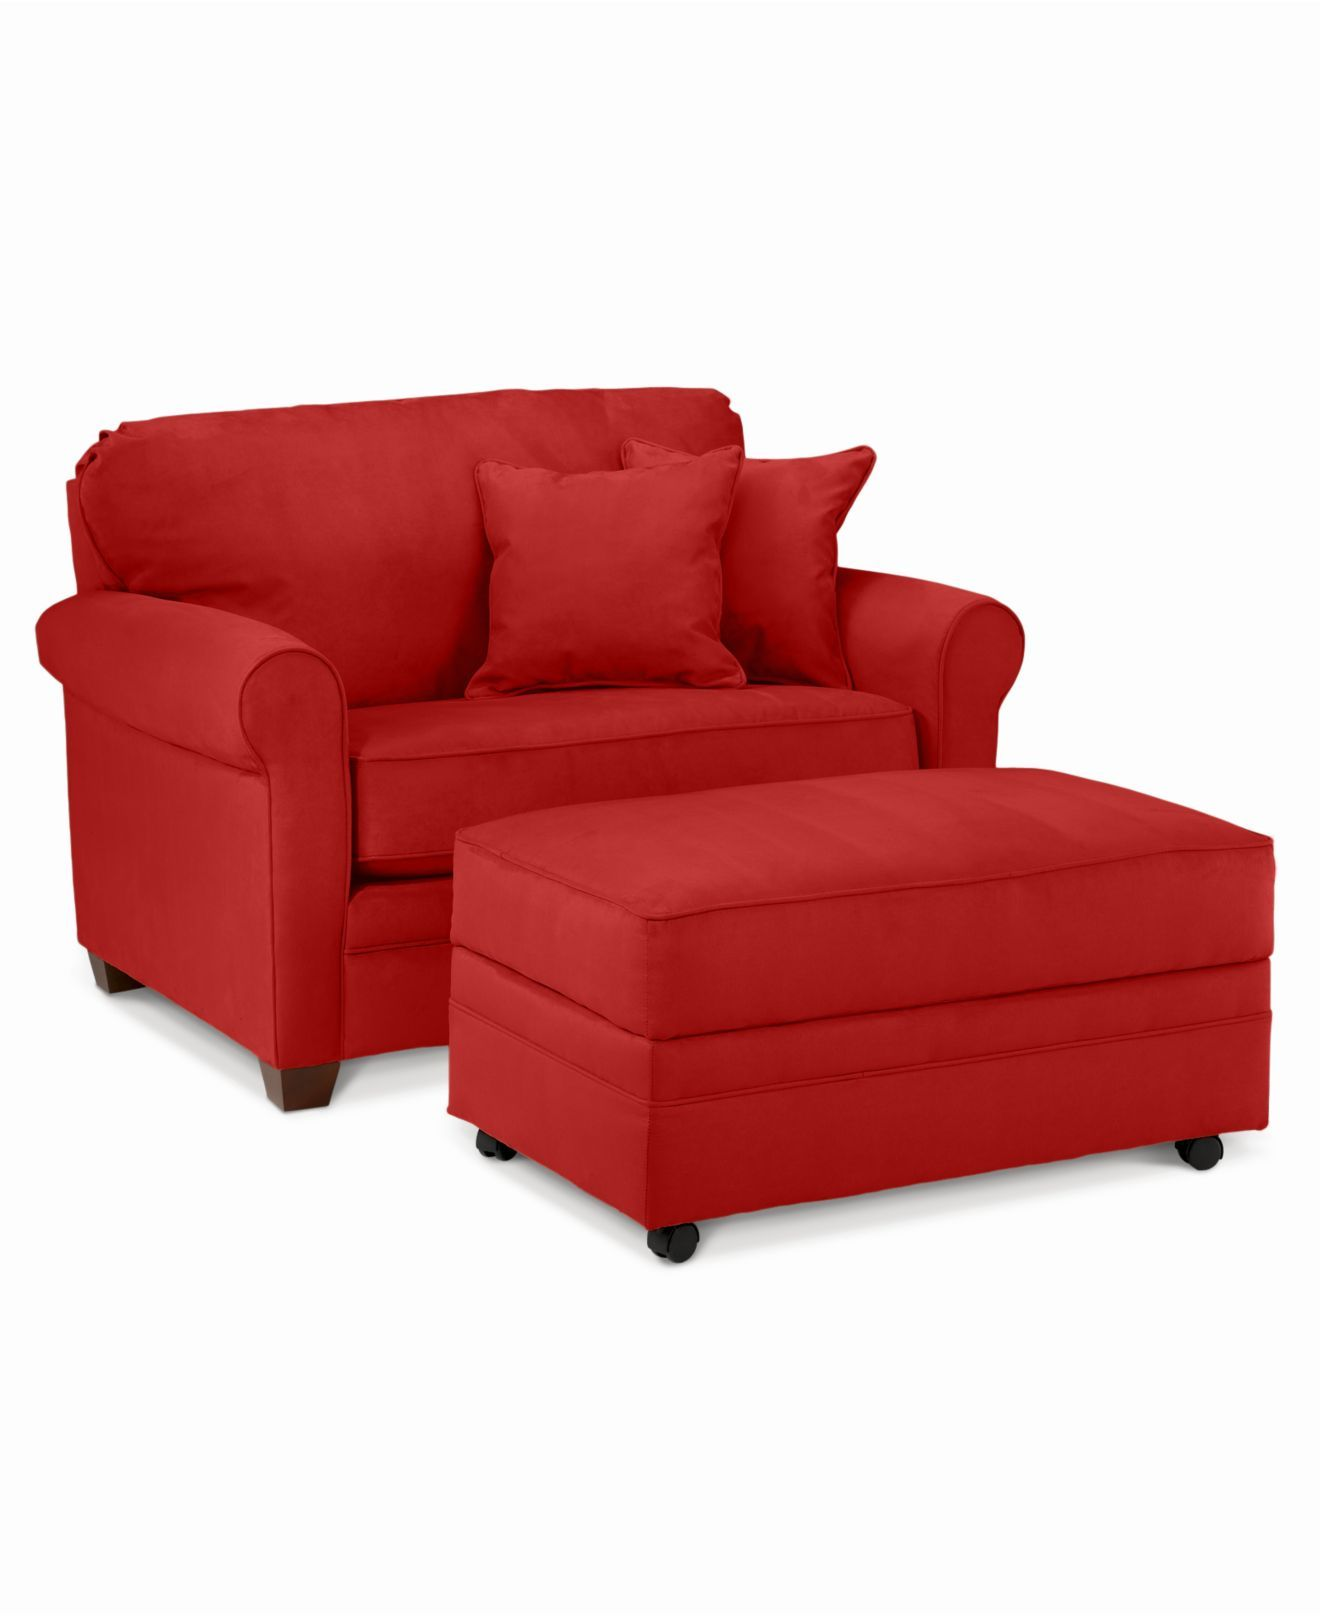 - Sasha Living Room Furniture, 2 Piece Sofa Set (Twin Sleeper And